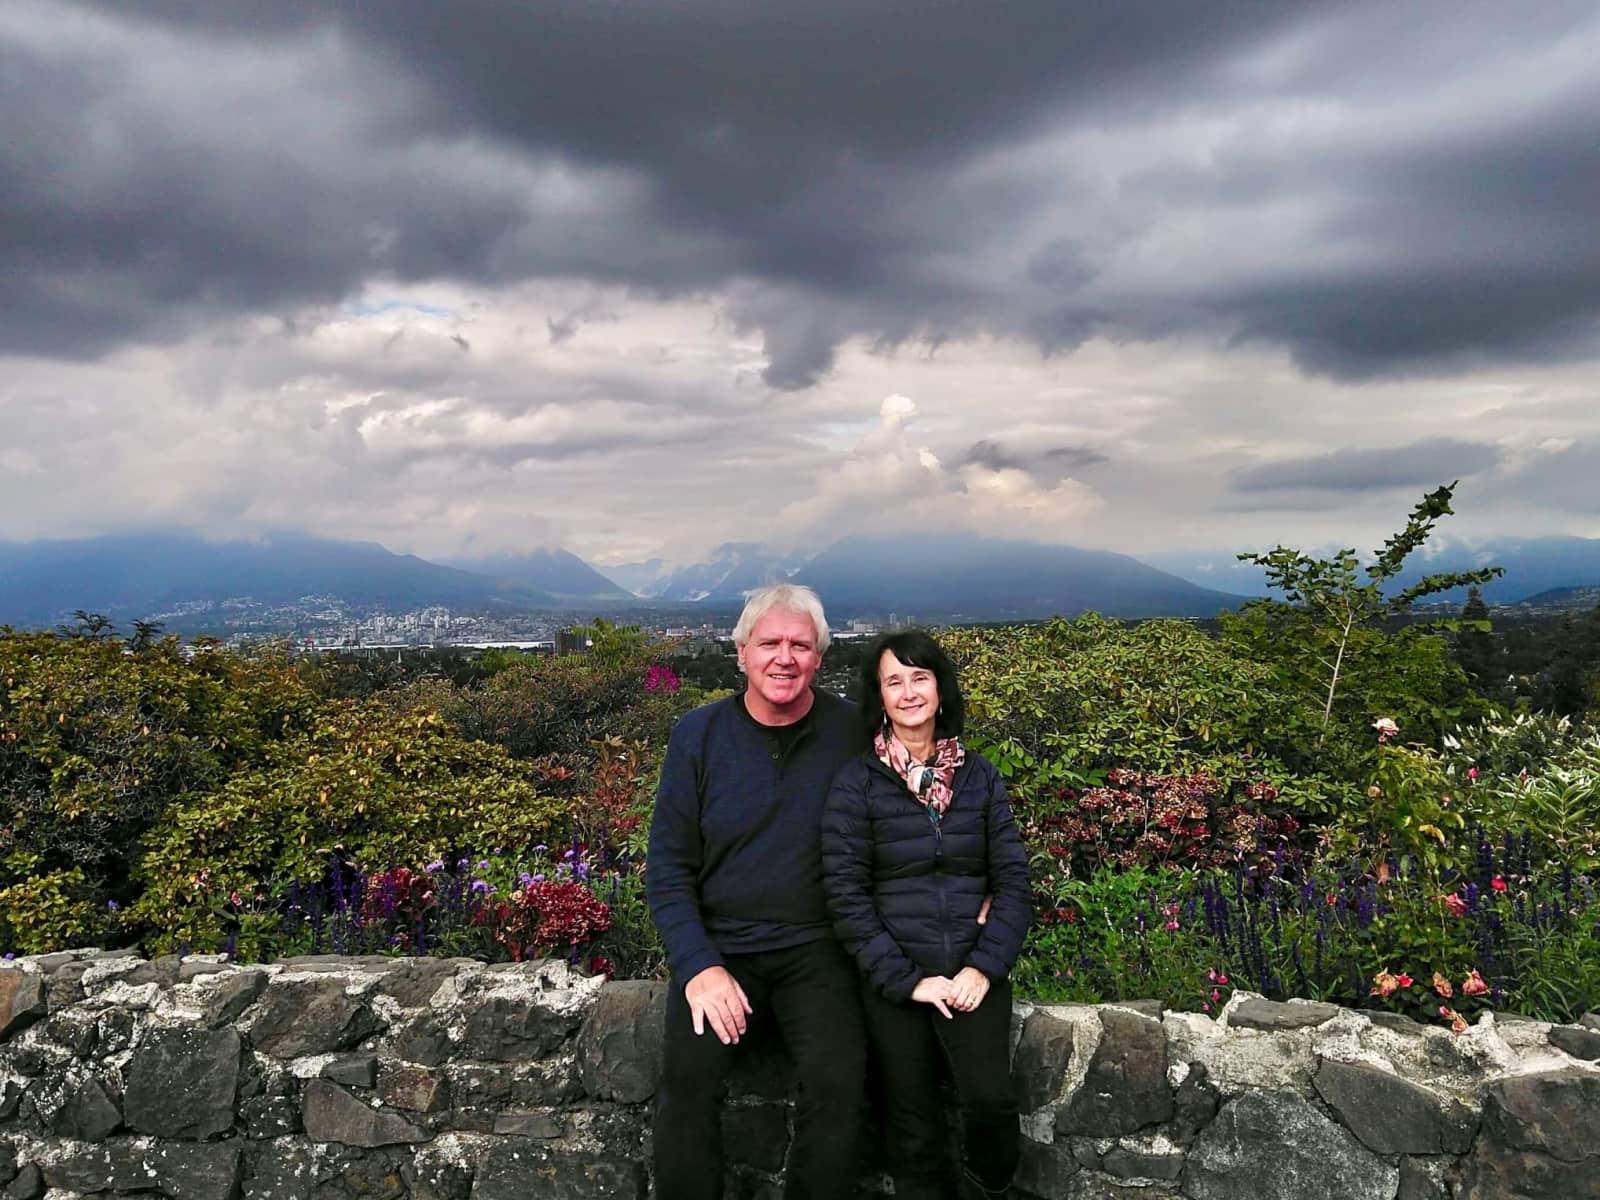 Janet & Tom from Kelowna, British Columbia, Canada